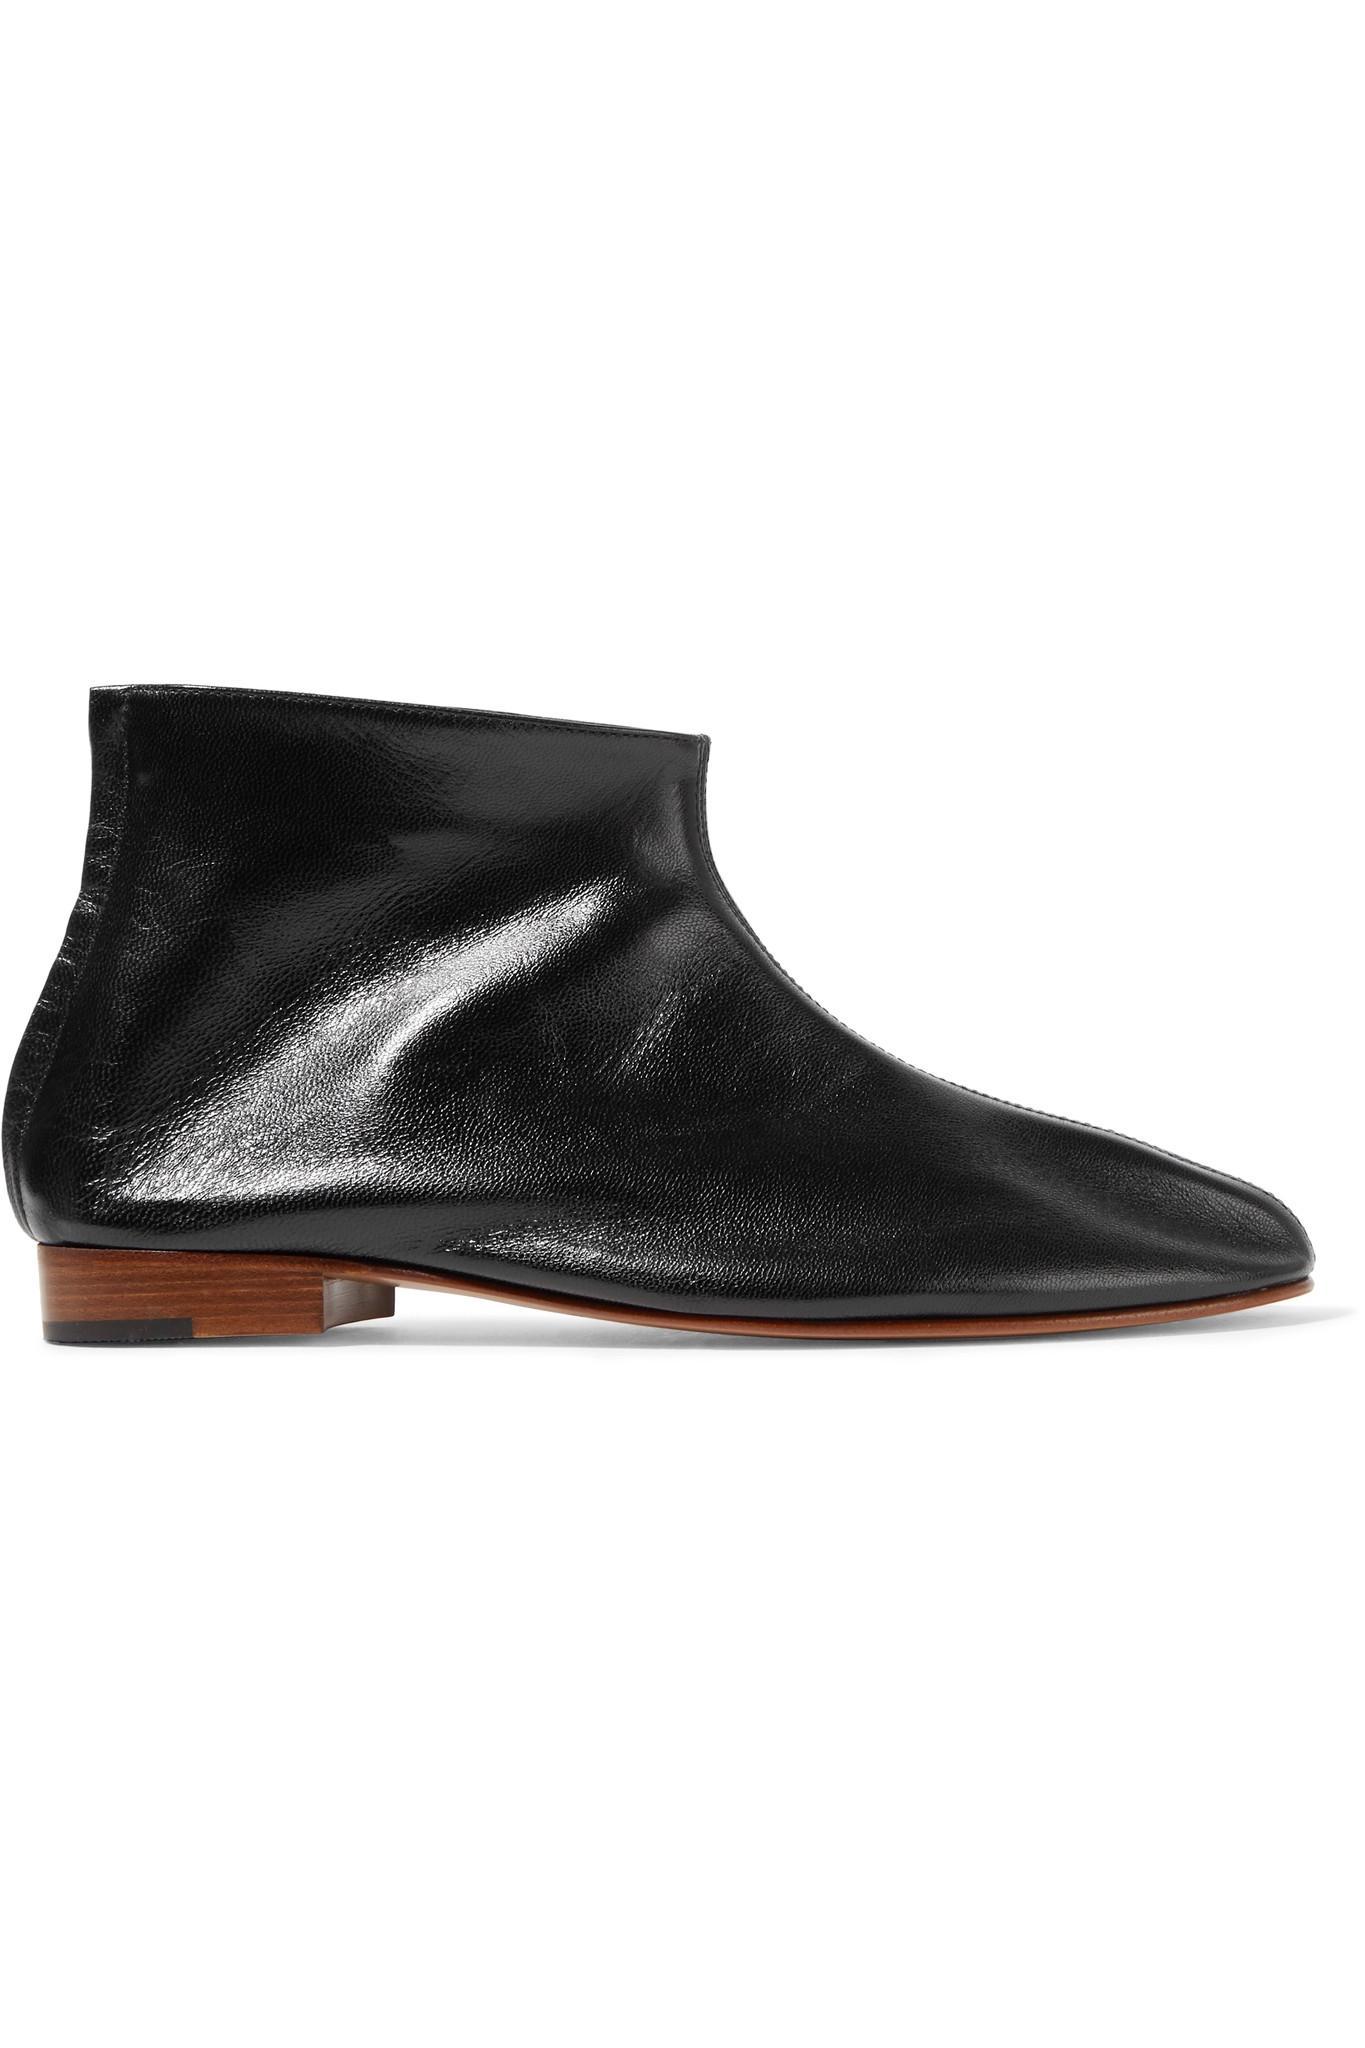 Martiniano Shoes Wearing